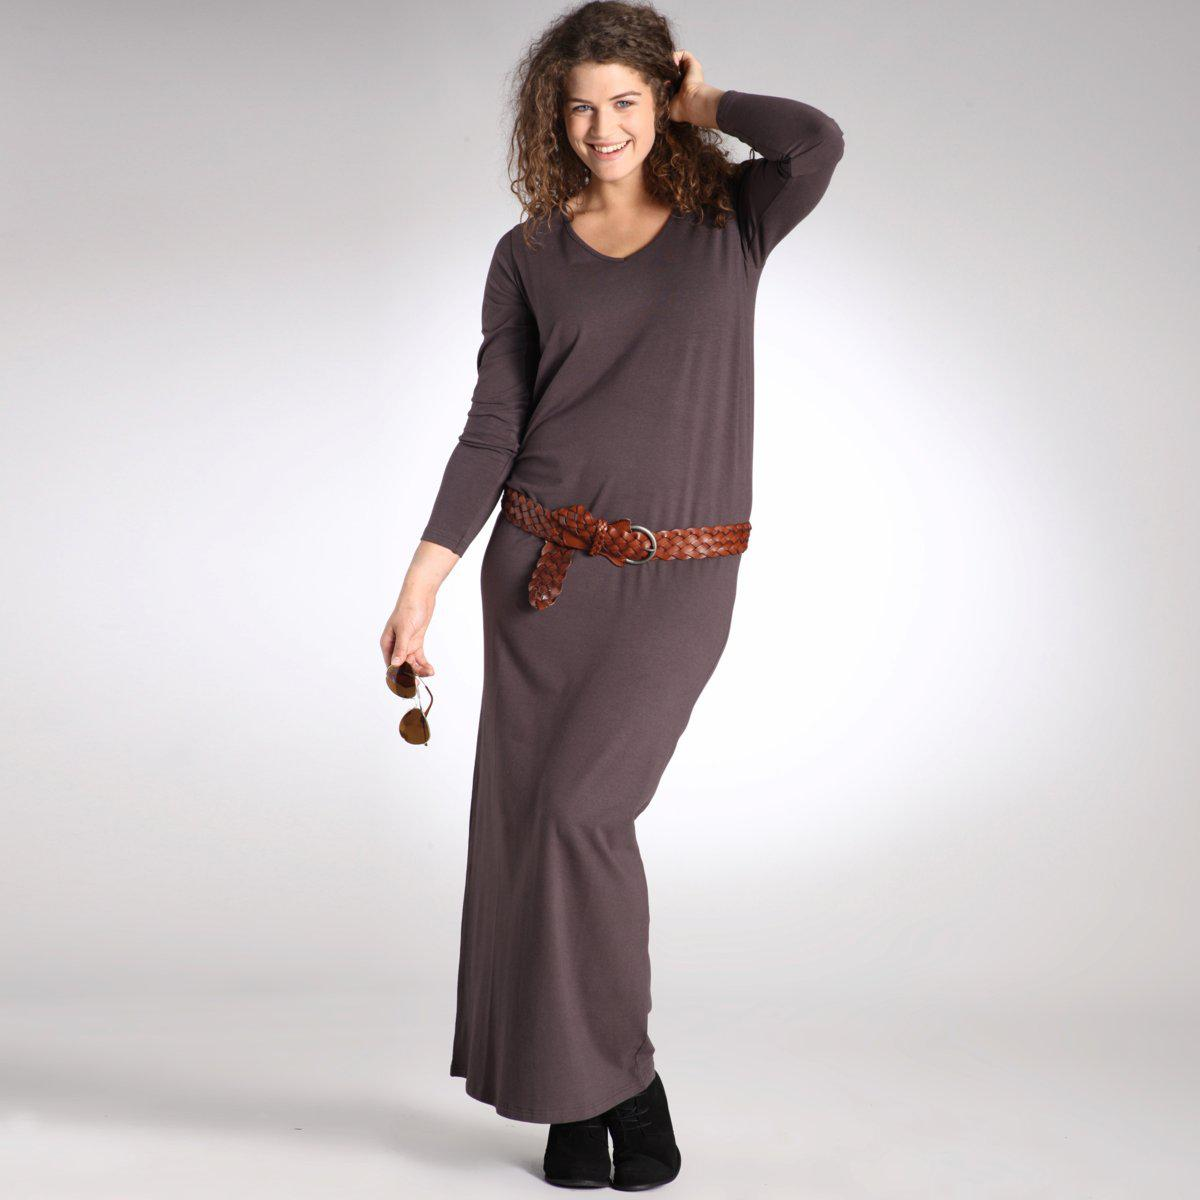 bradyna foremata 219 - Βραδυνα Φορεματα LaRedoute Φθινόπωρο 2011 Κωδ. 324205648